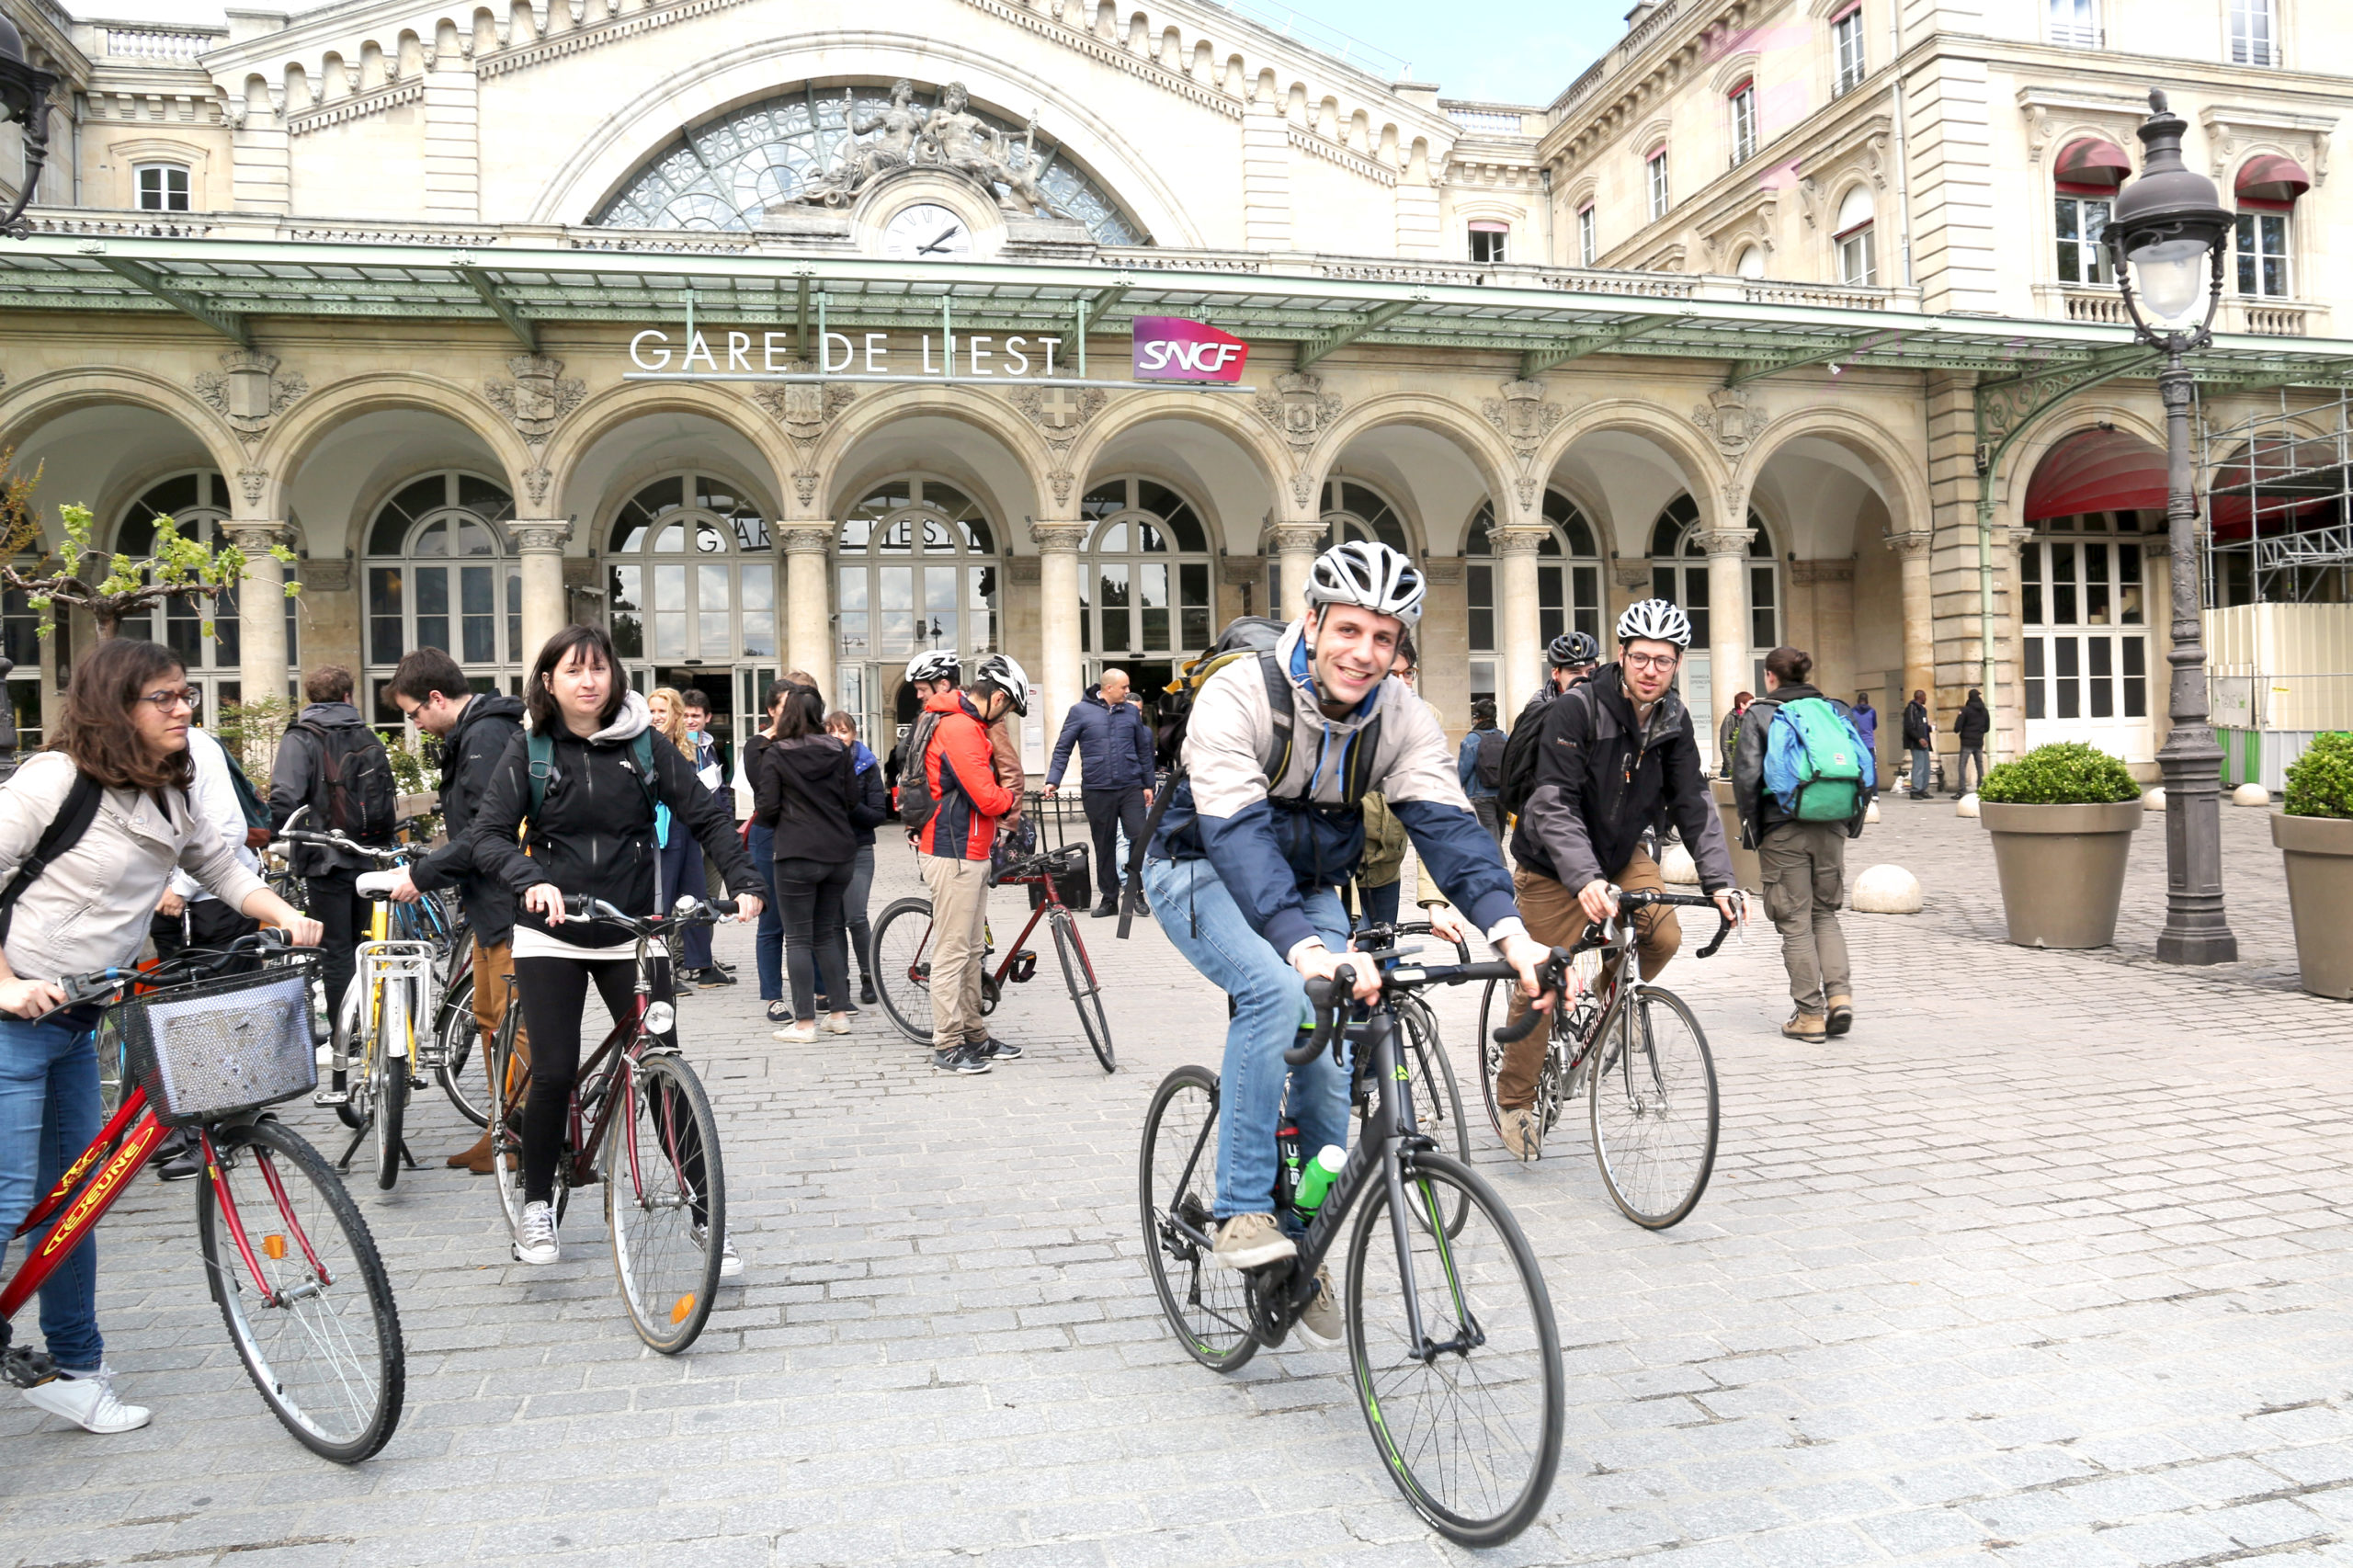 Cocyclette jeu de piste vélo urbain améliorer expérience salariés